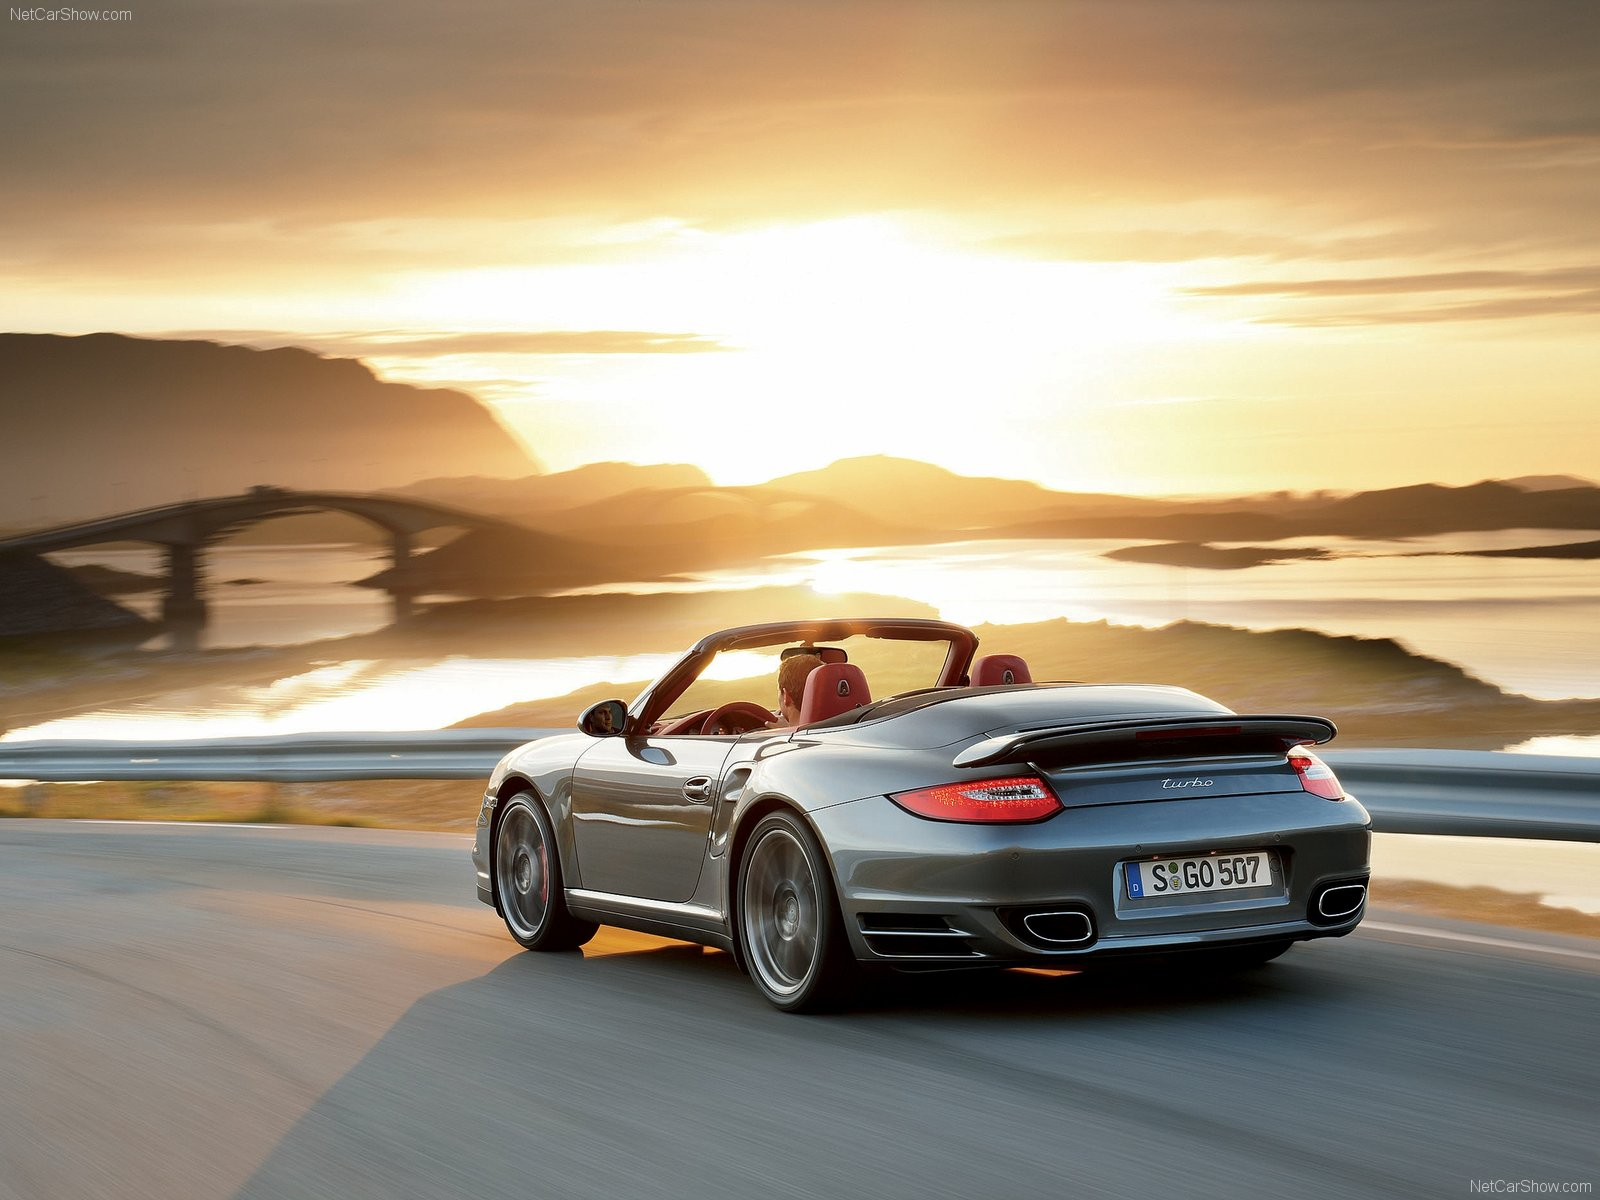 2010 Grey Porsche 911 Turbo Cabriolet Wallpapers